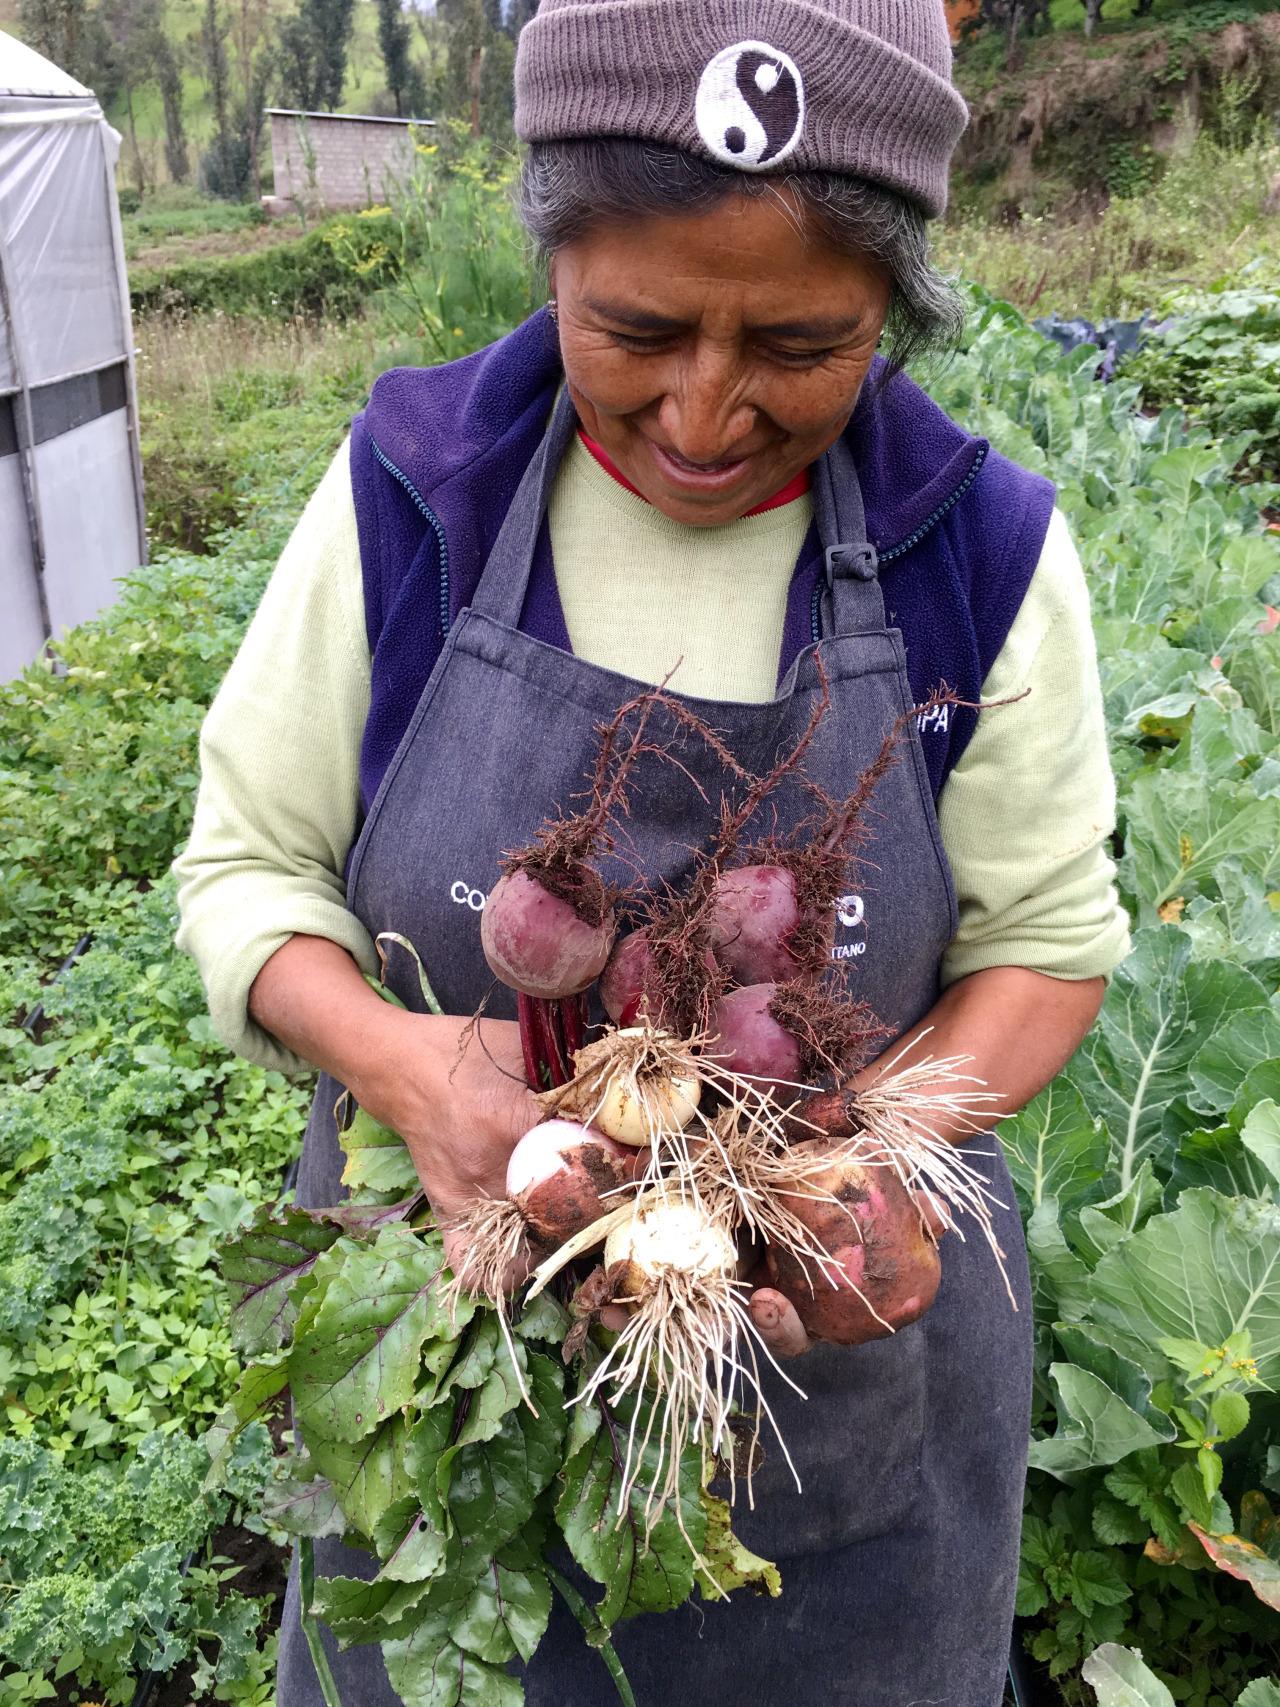 Señora Elvira with a bouquet of vegetables from her garden